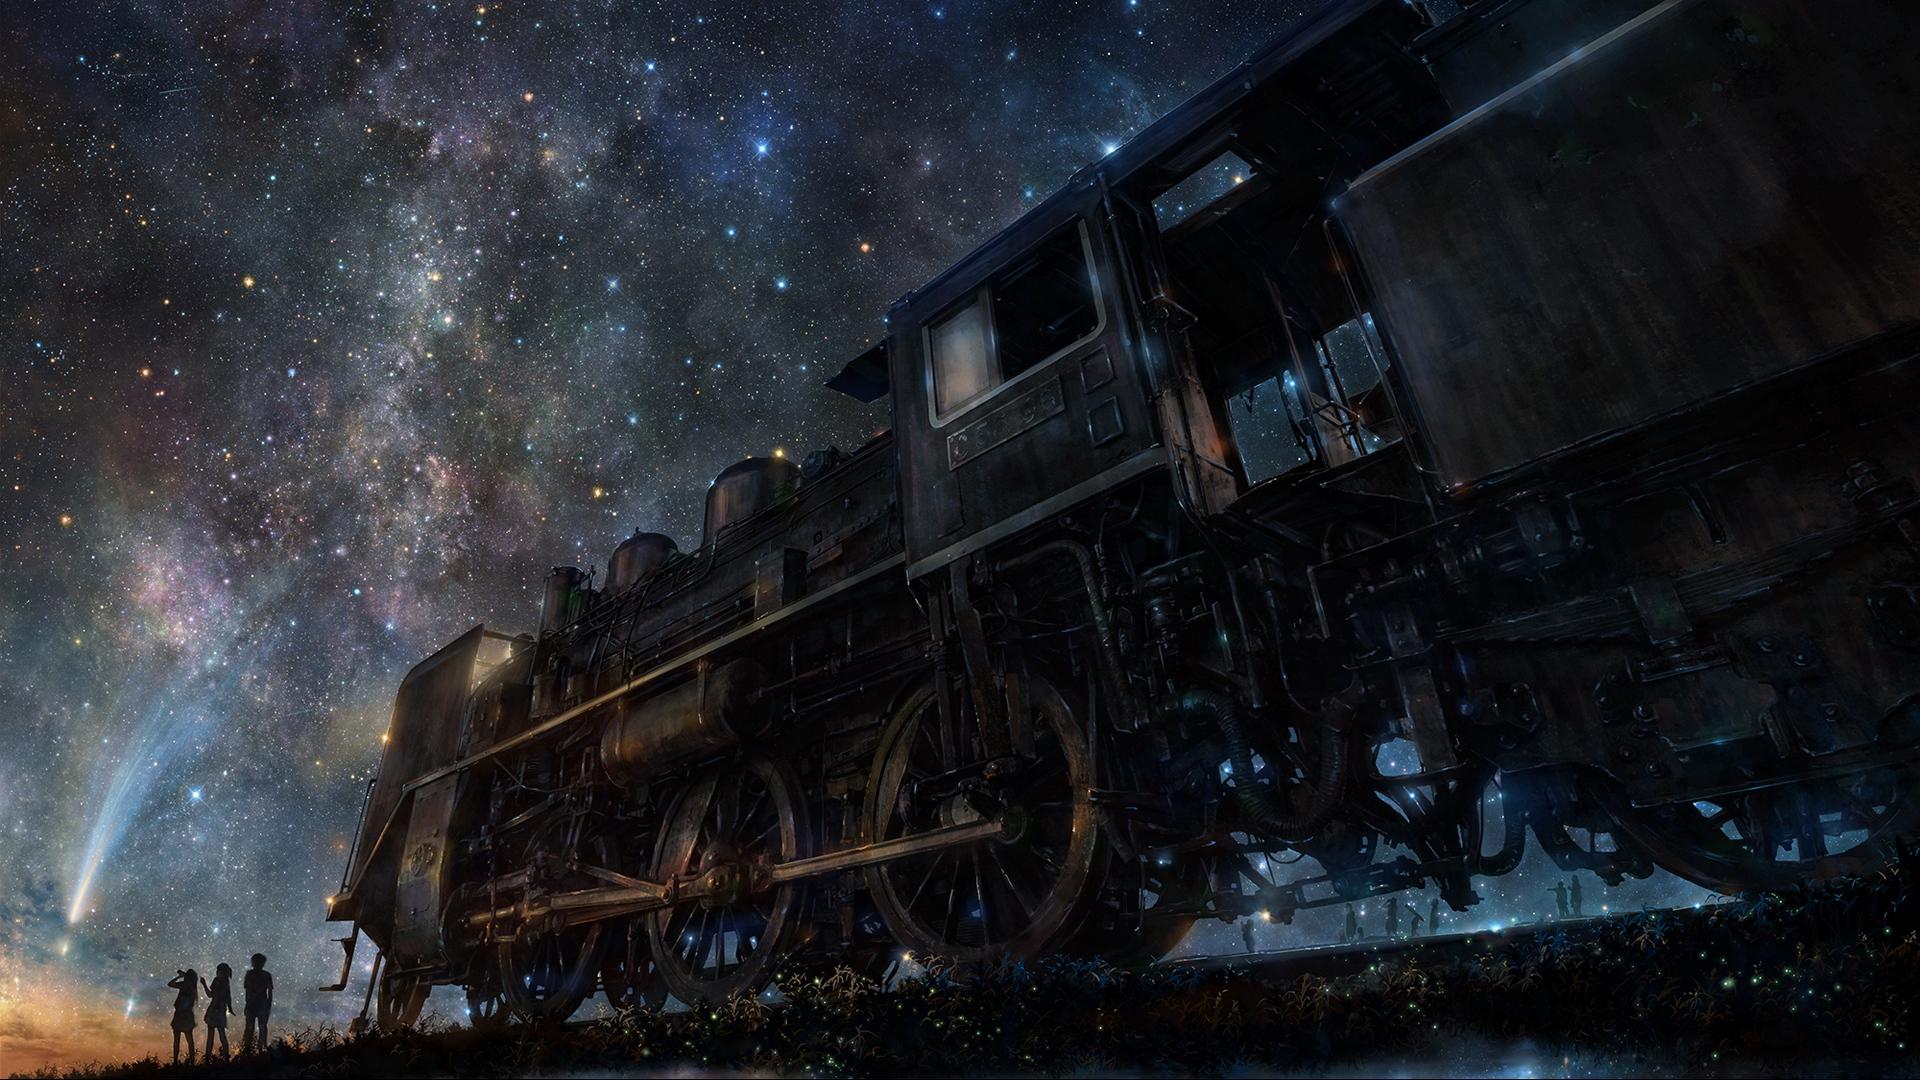 wallpaper iy tujiki train anime starry night 1920x1080